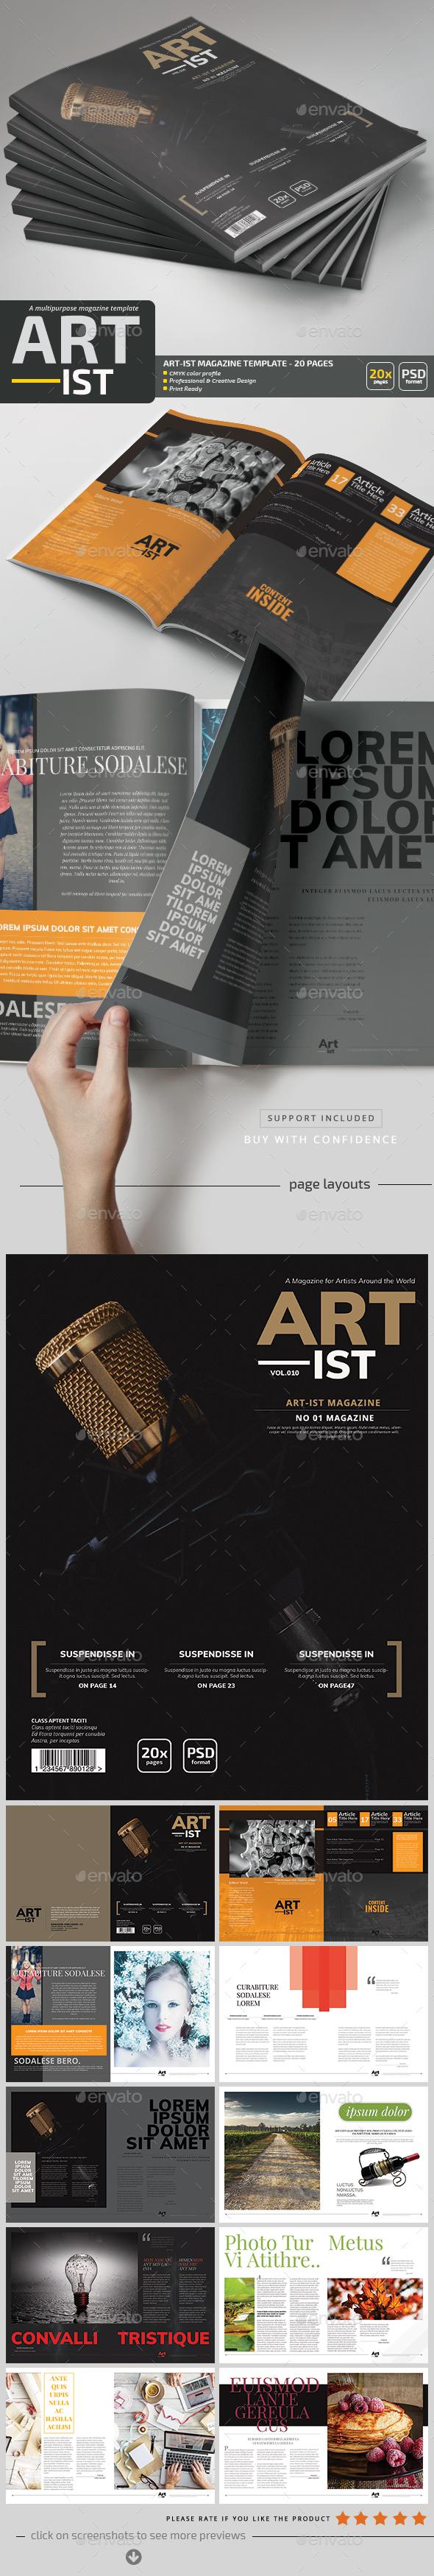 Art-ist Magazine Template V.10 - Magazines Print Templates